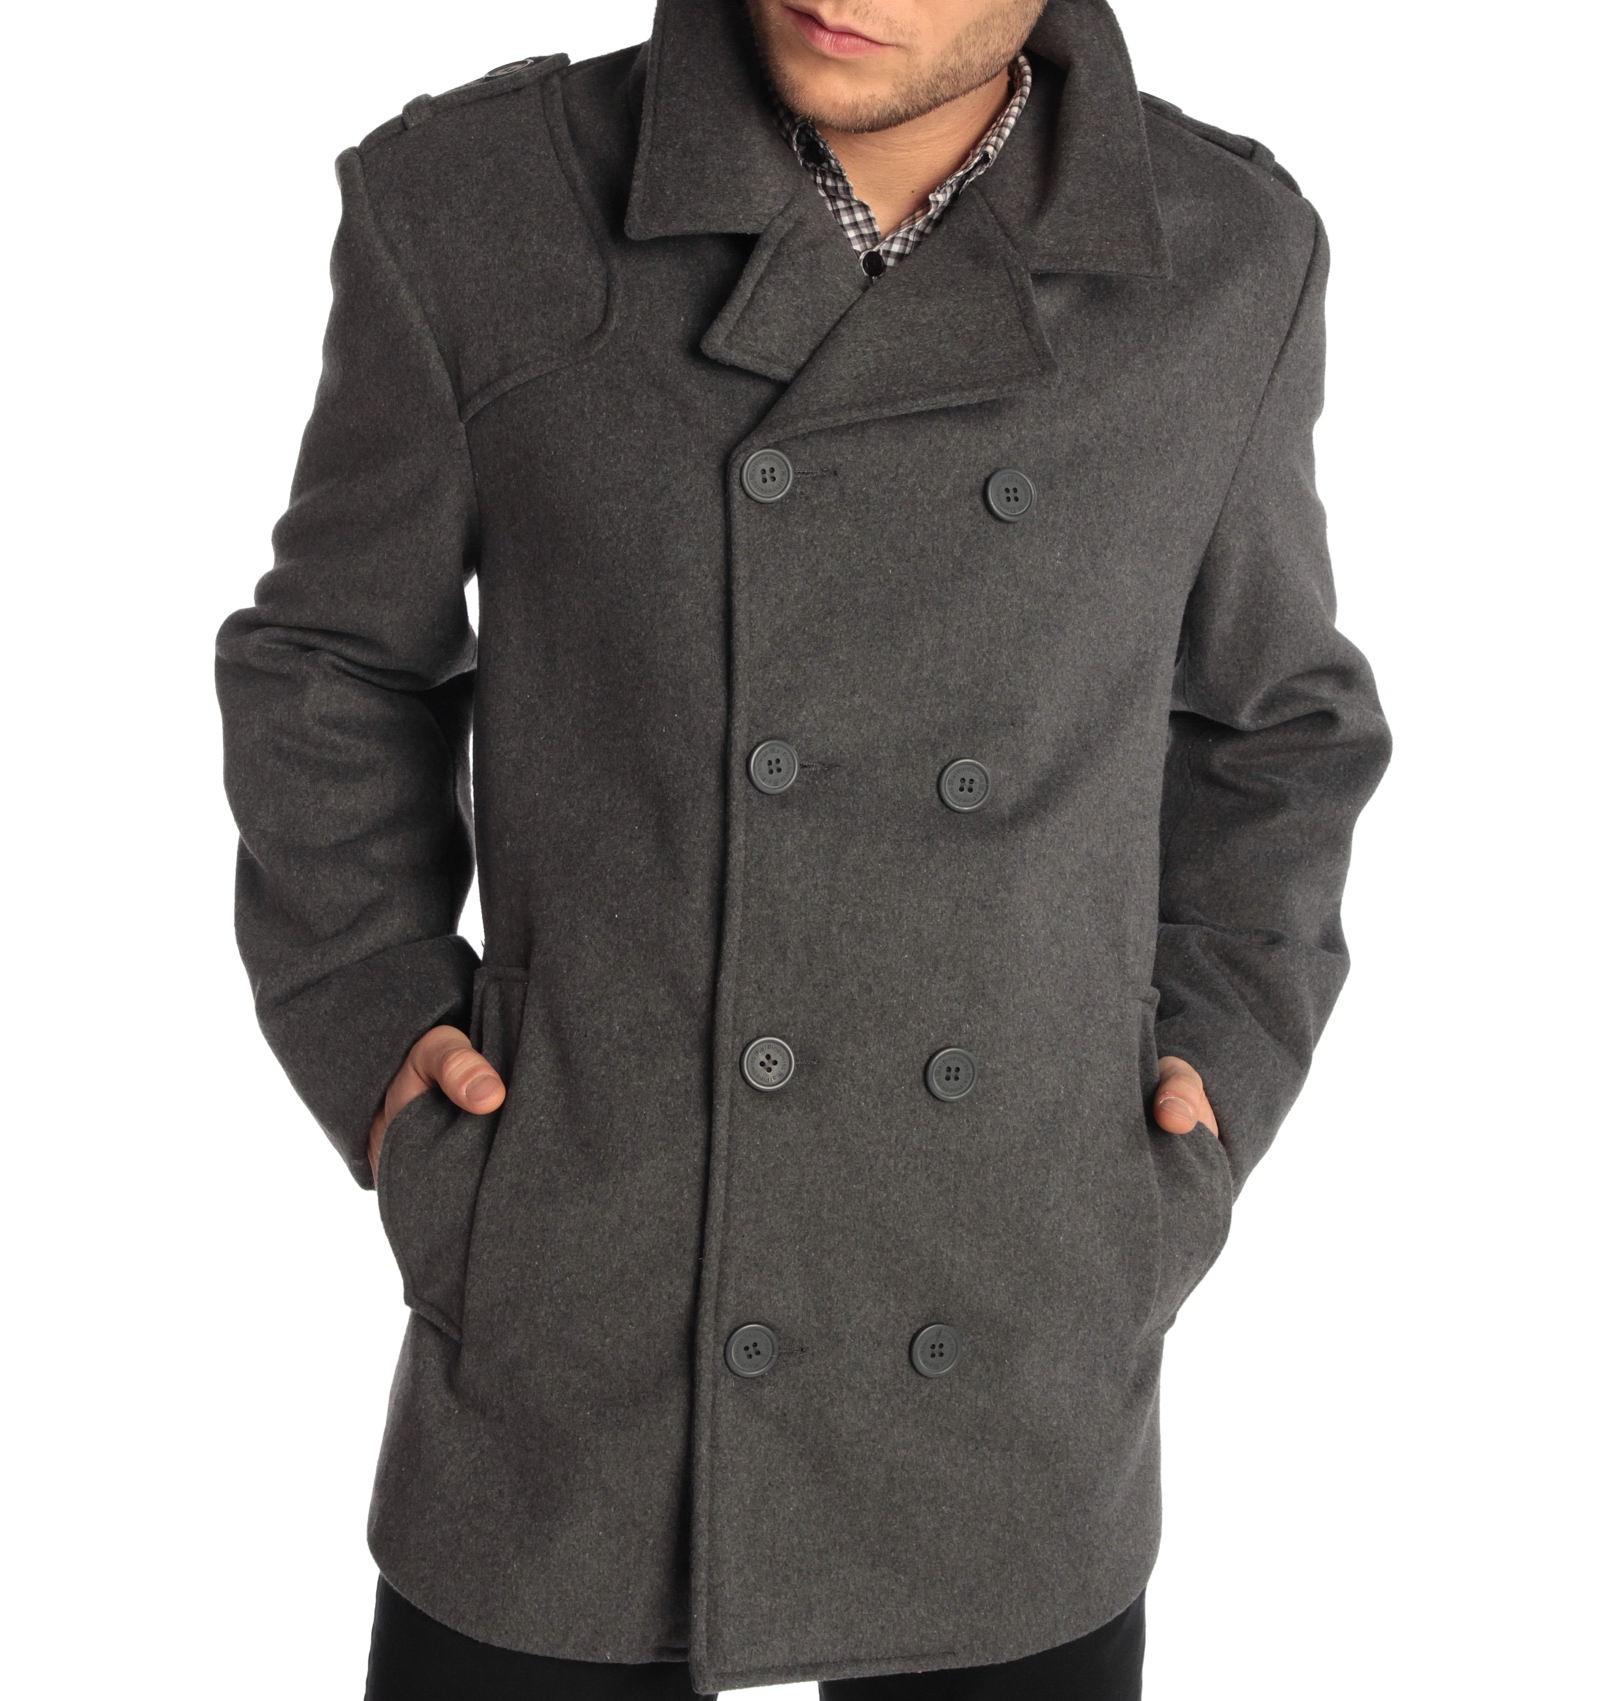 Alpine Swiss Jake Mens Pea Coat $29.99 Shipped